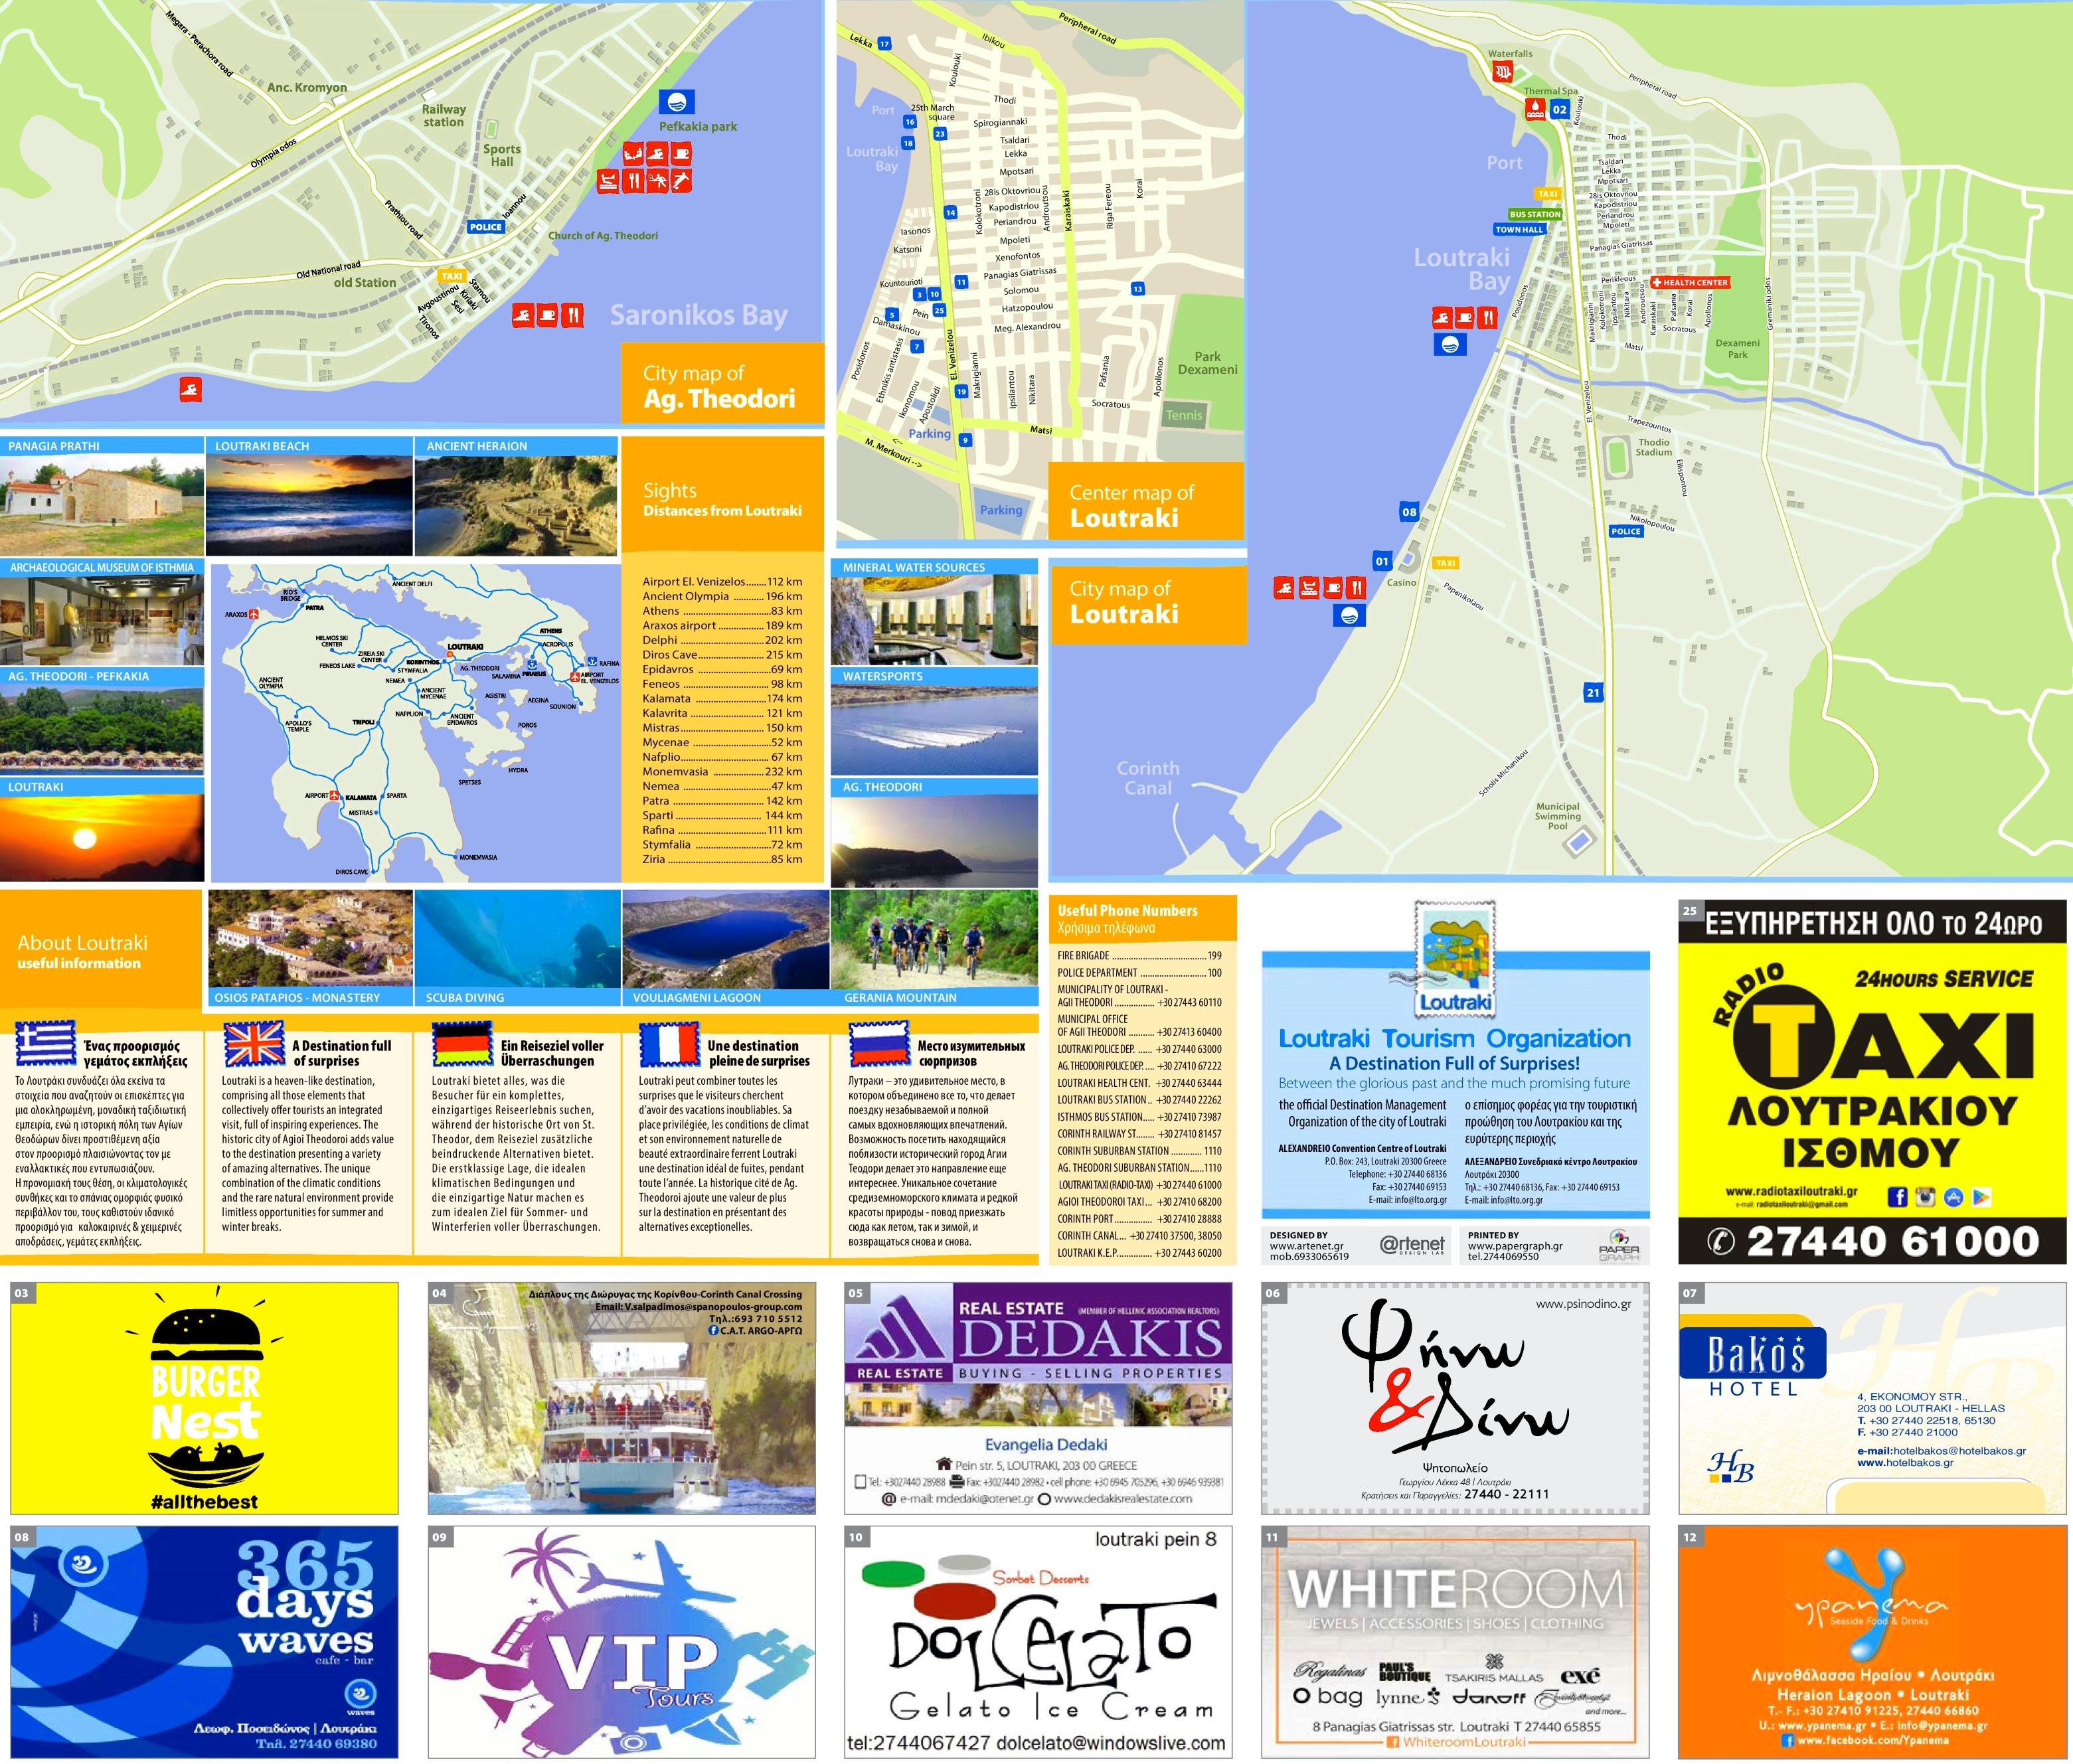 Loutraki tourist attractions map